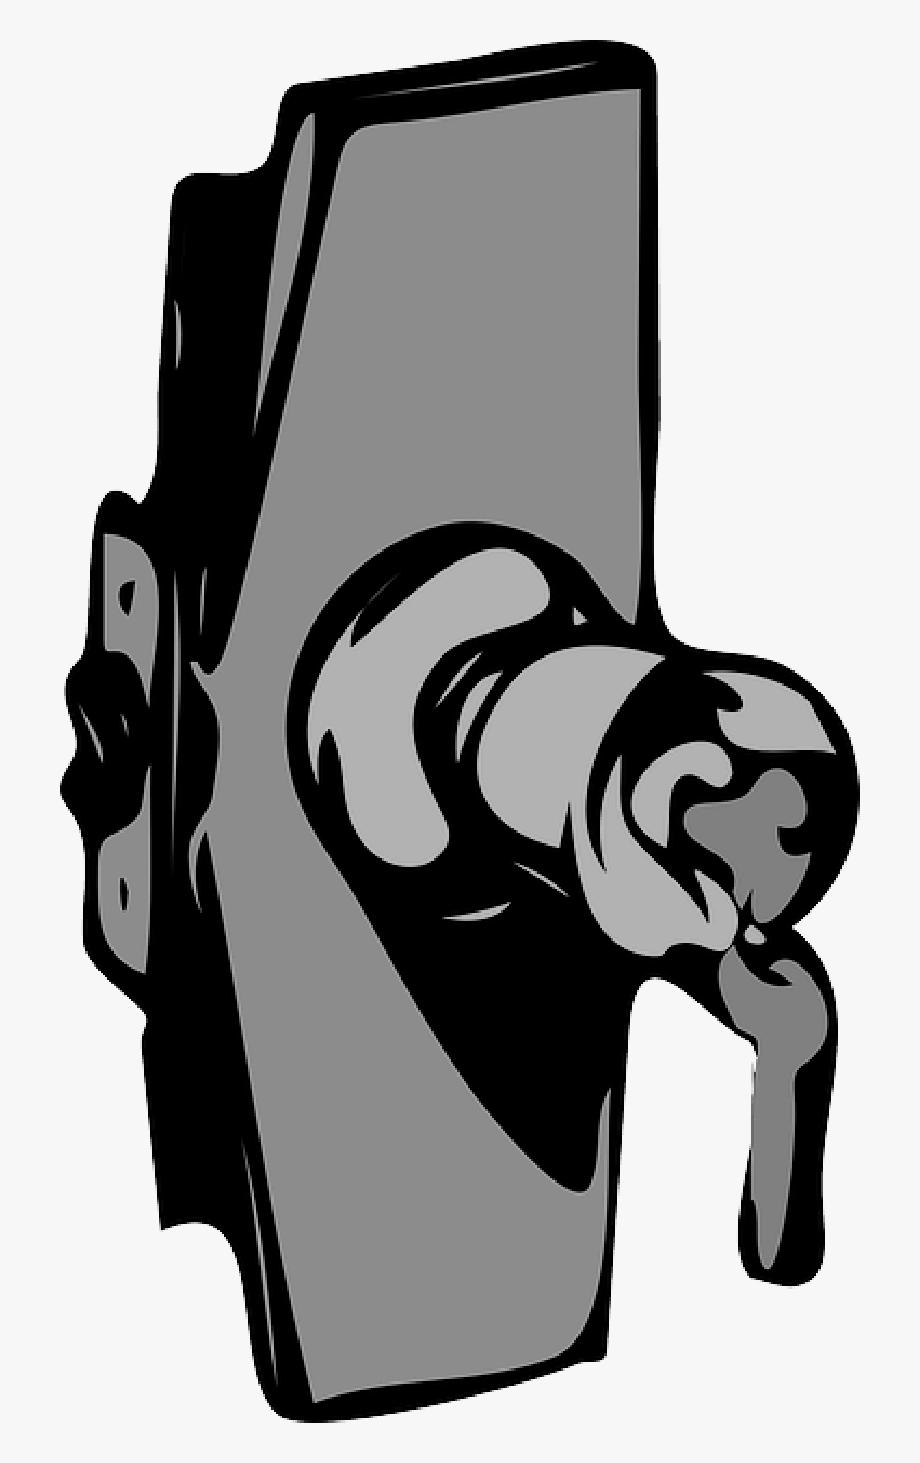 Lock the door clipart royalty free stock Download Clipart - Door Lock Clip Art #531072 - Free Cliparts on ... royalty free stock